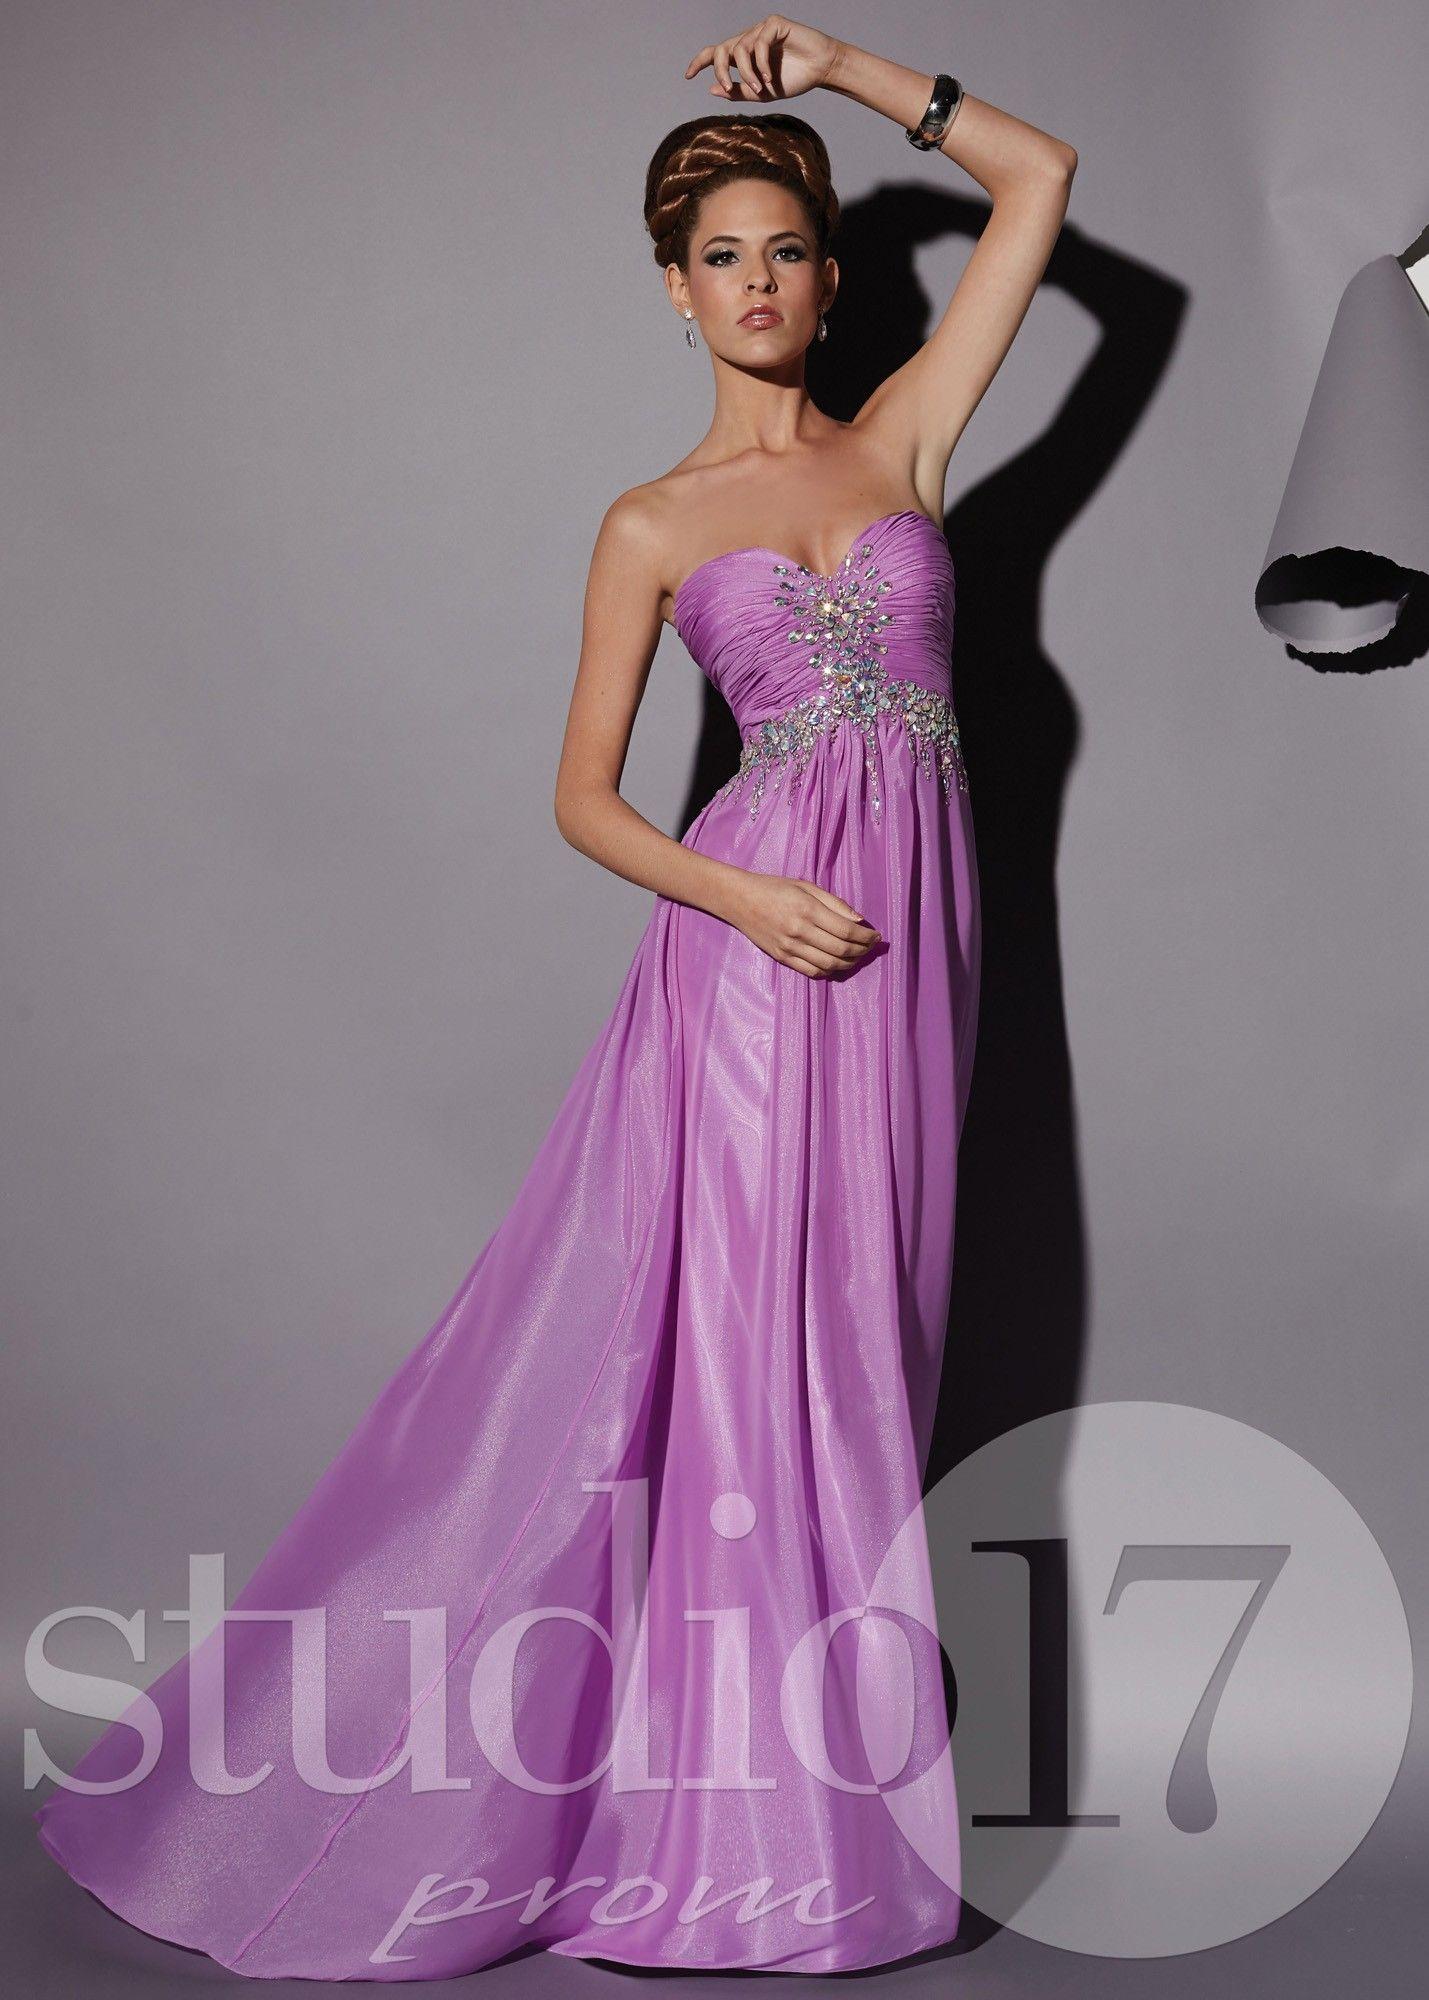 Studio 17 12468 Sweetheart Prom Dress | VESTIDOS PARA QUINCEAÑERA ...